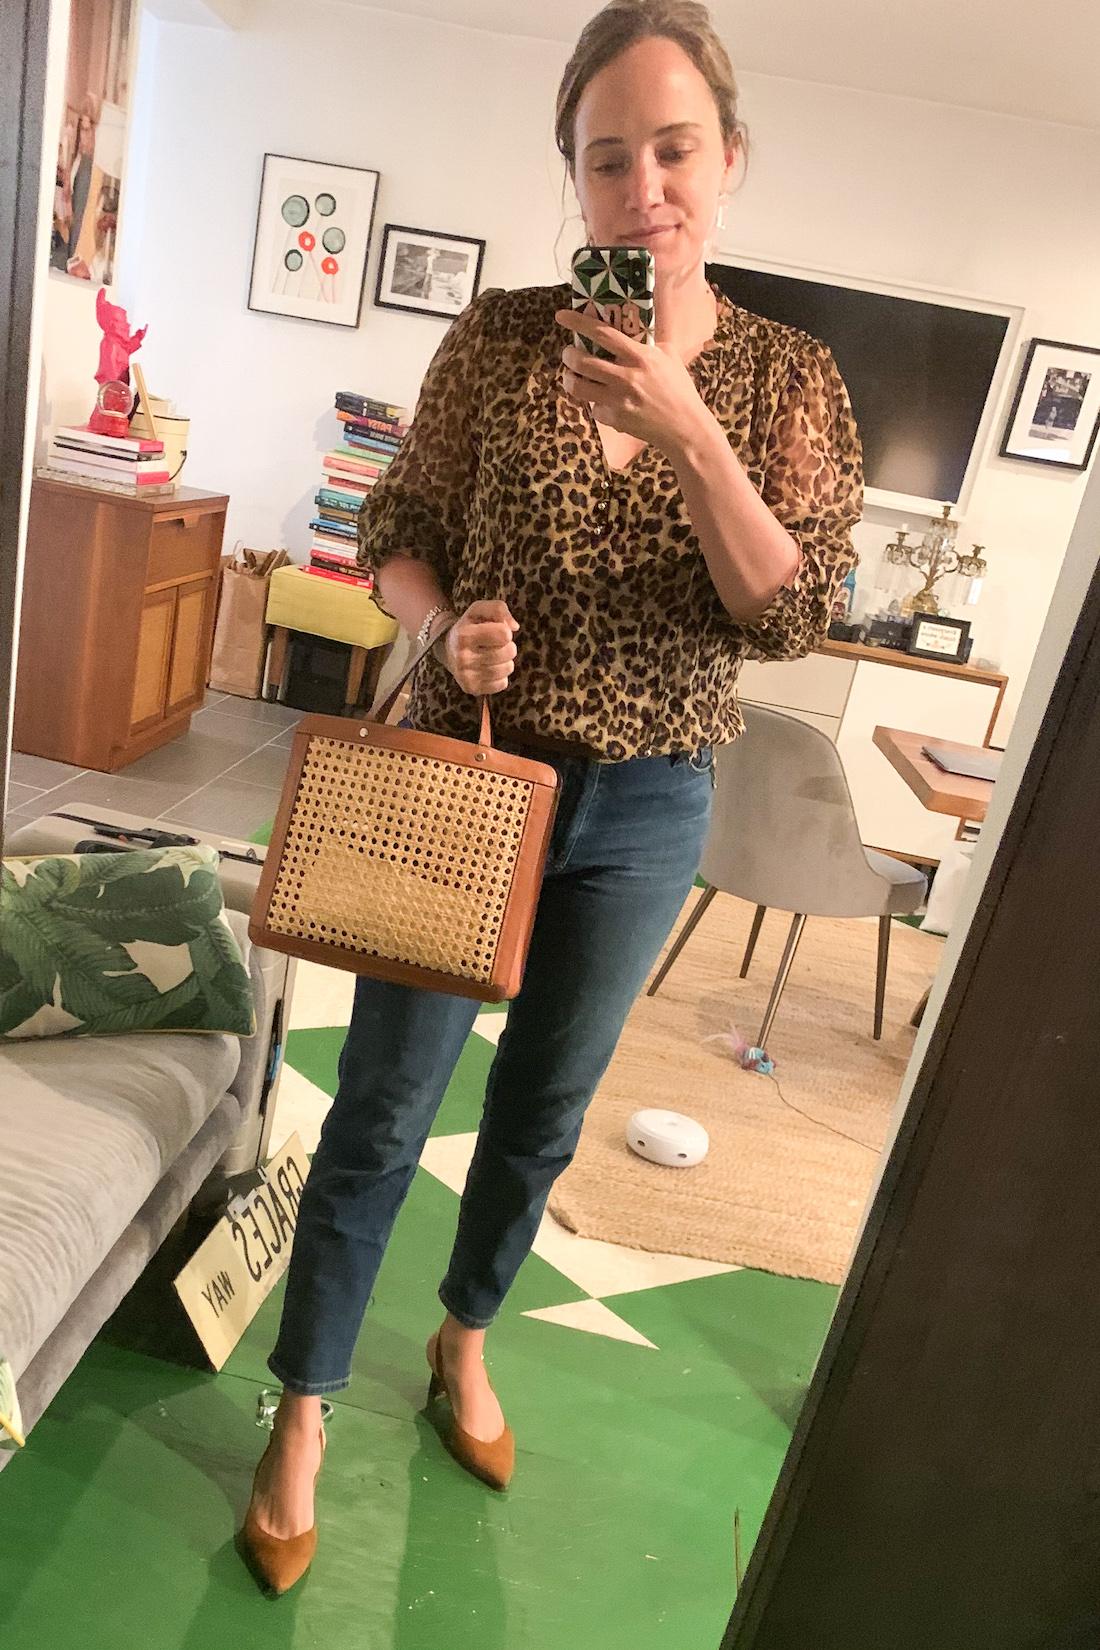 grace wearing a cheetah blouse